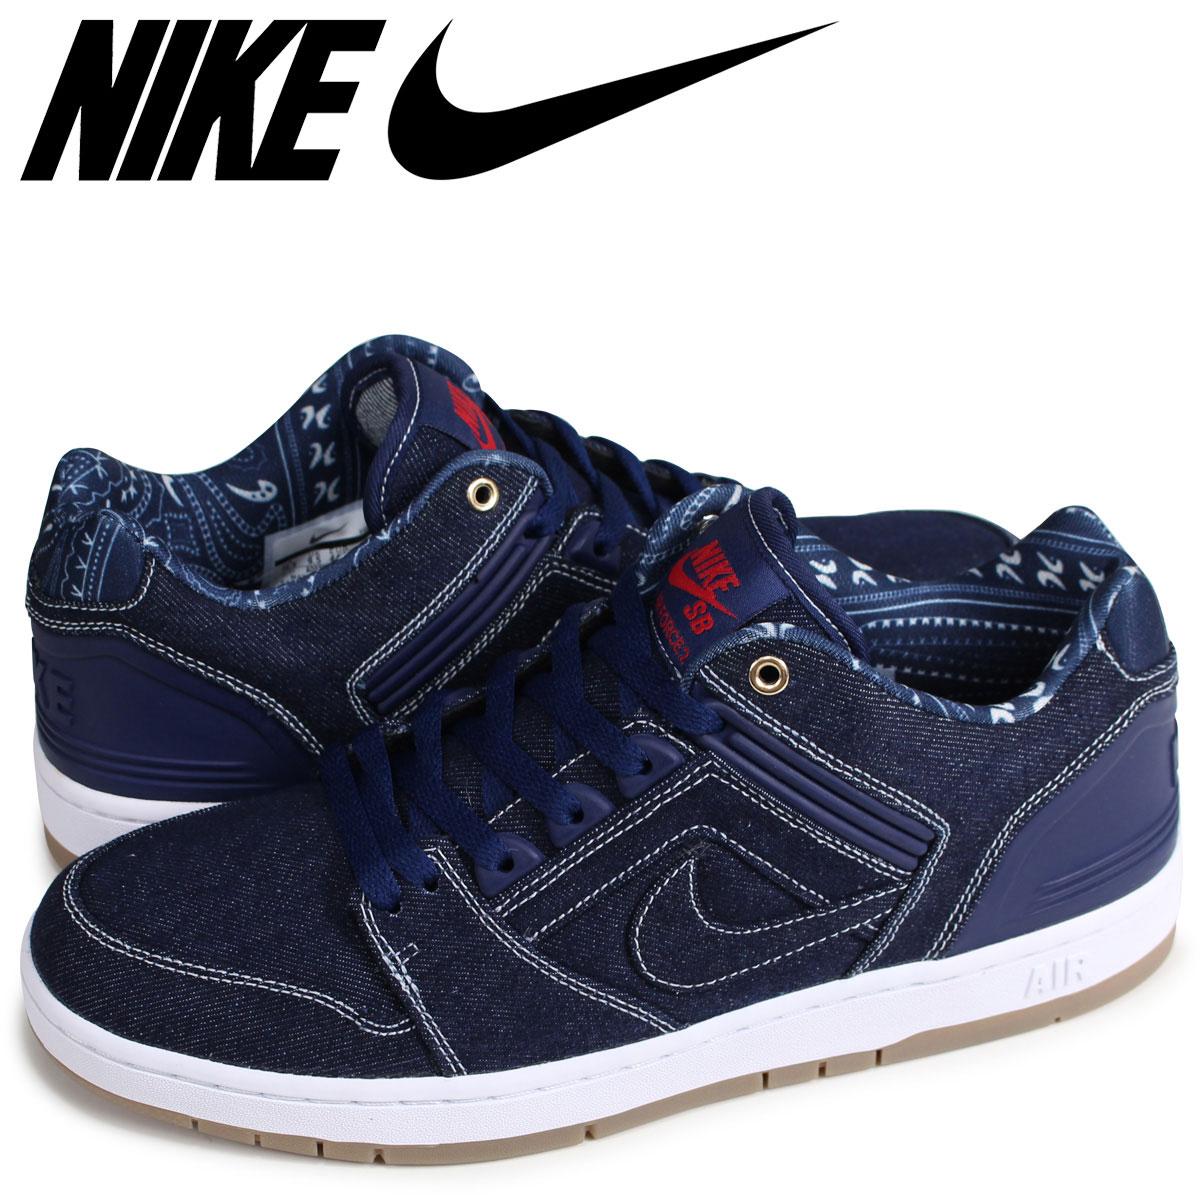 half off ddac6 93c45 NIKE SB AIR FORCE 2 LOW QS 2PAC Nike air force 2 sneakers men AO0298-441  navy  187